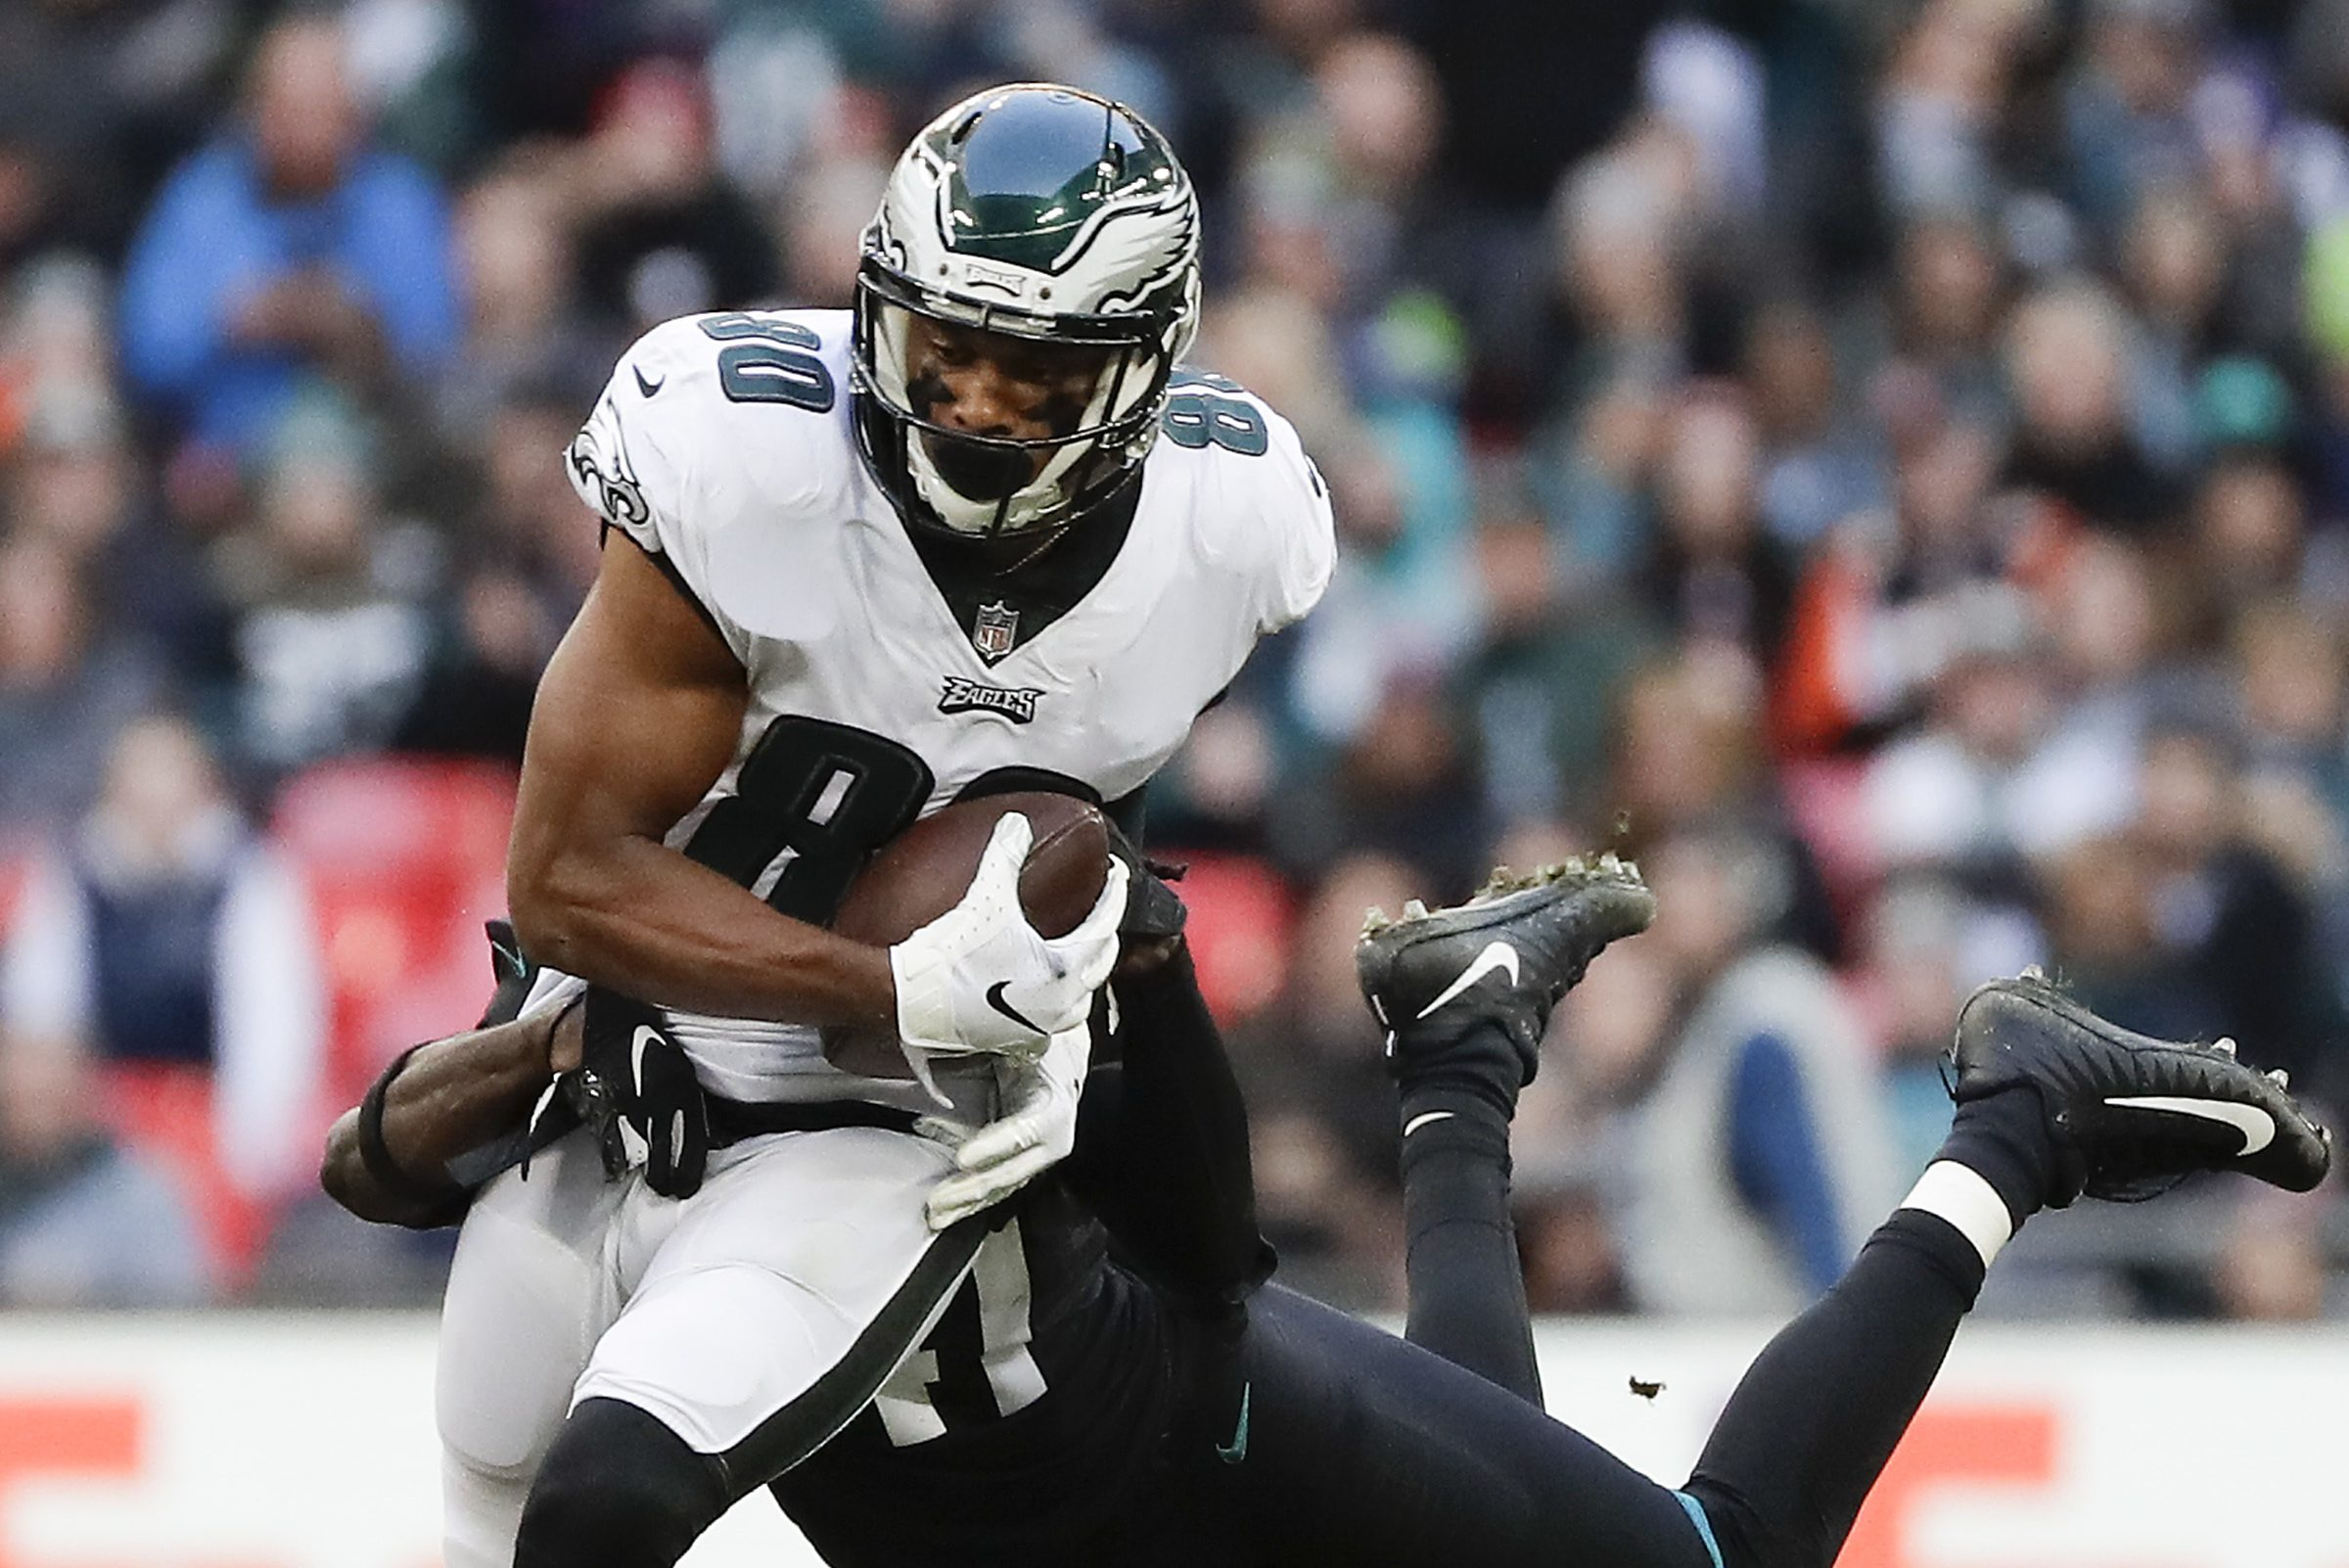 Jordan Matthews is back in familiar spot as Eagles' leading receiver vs. Jaguars — but producing in different ways